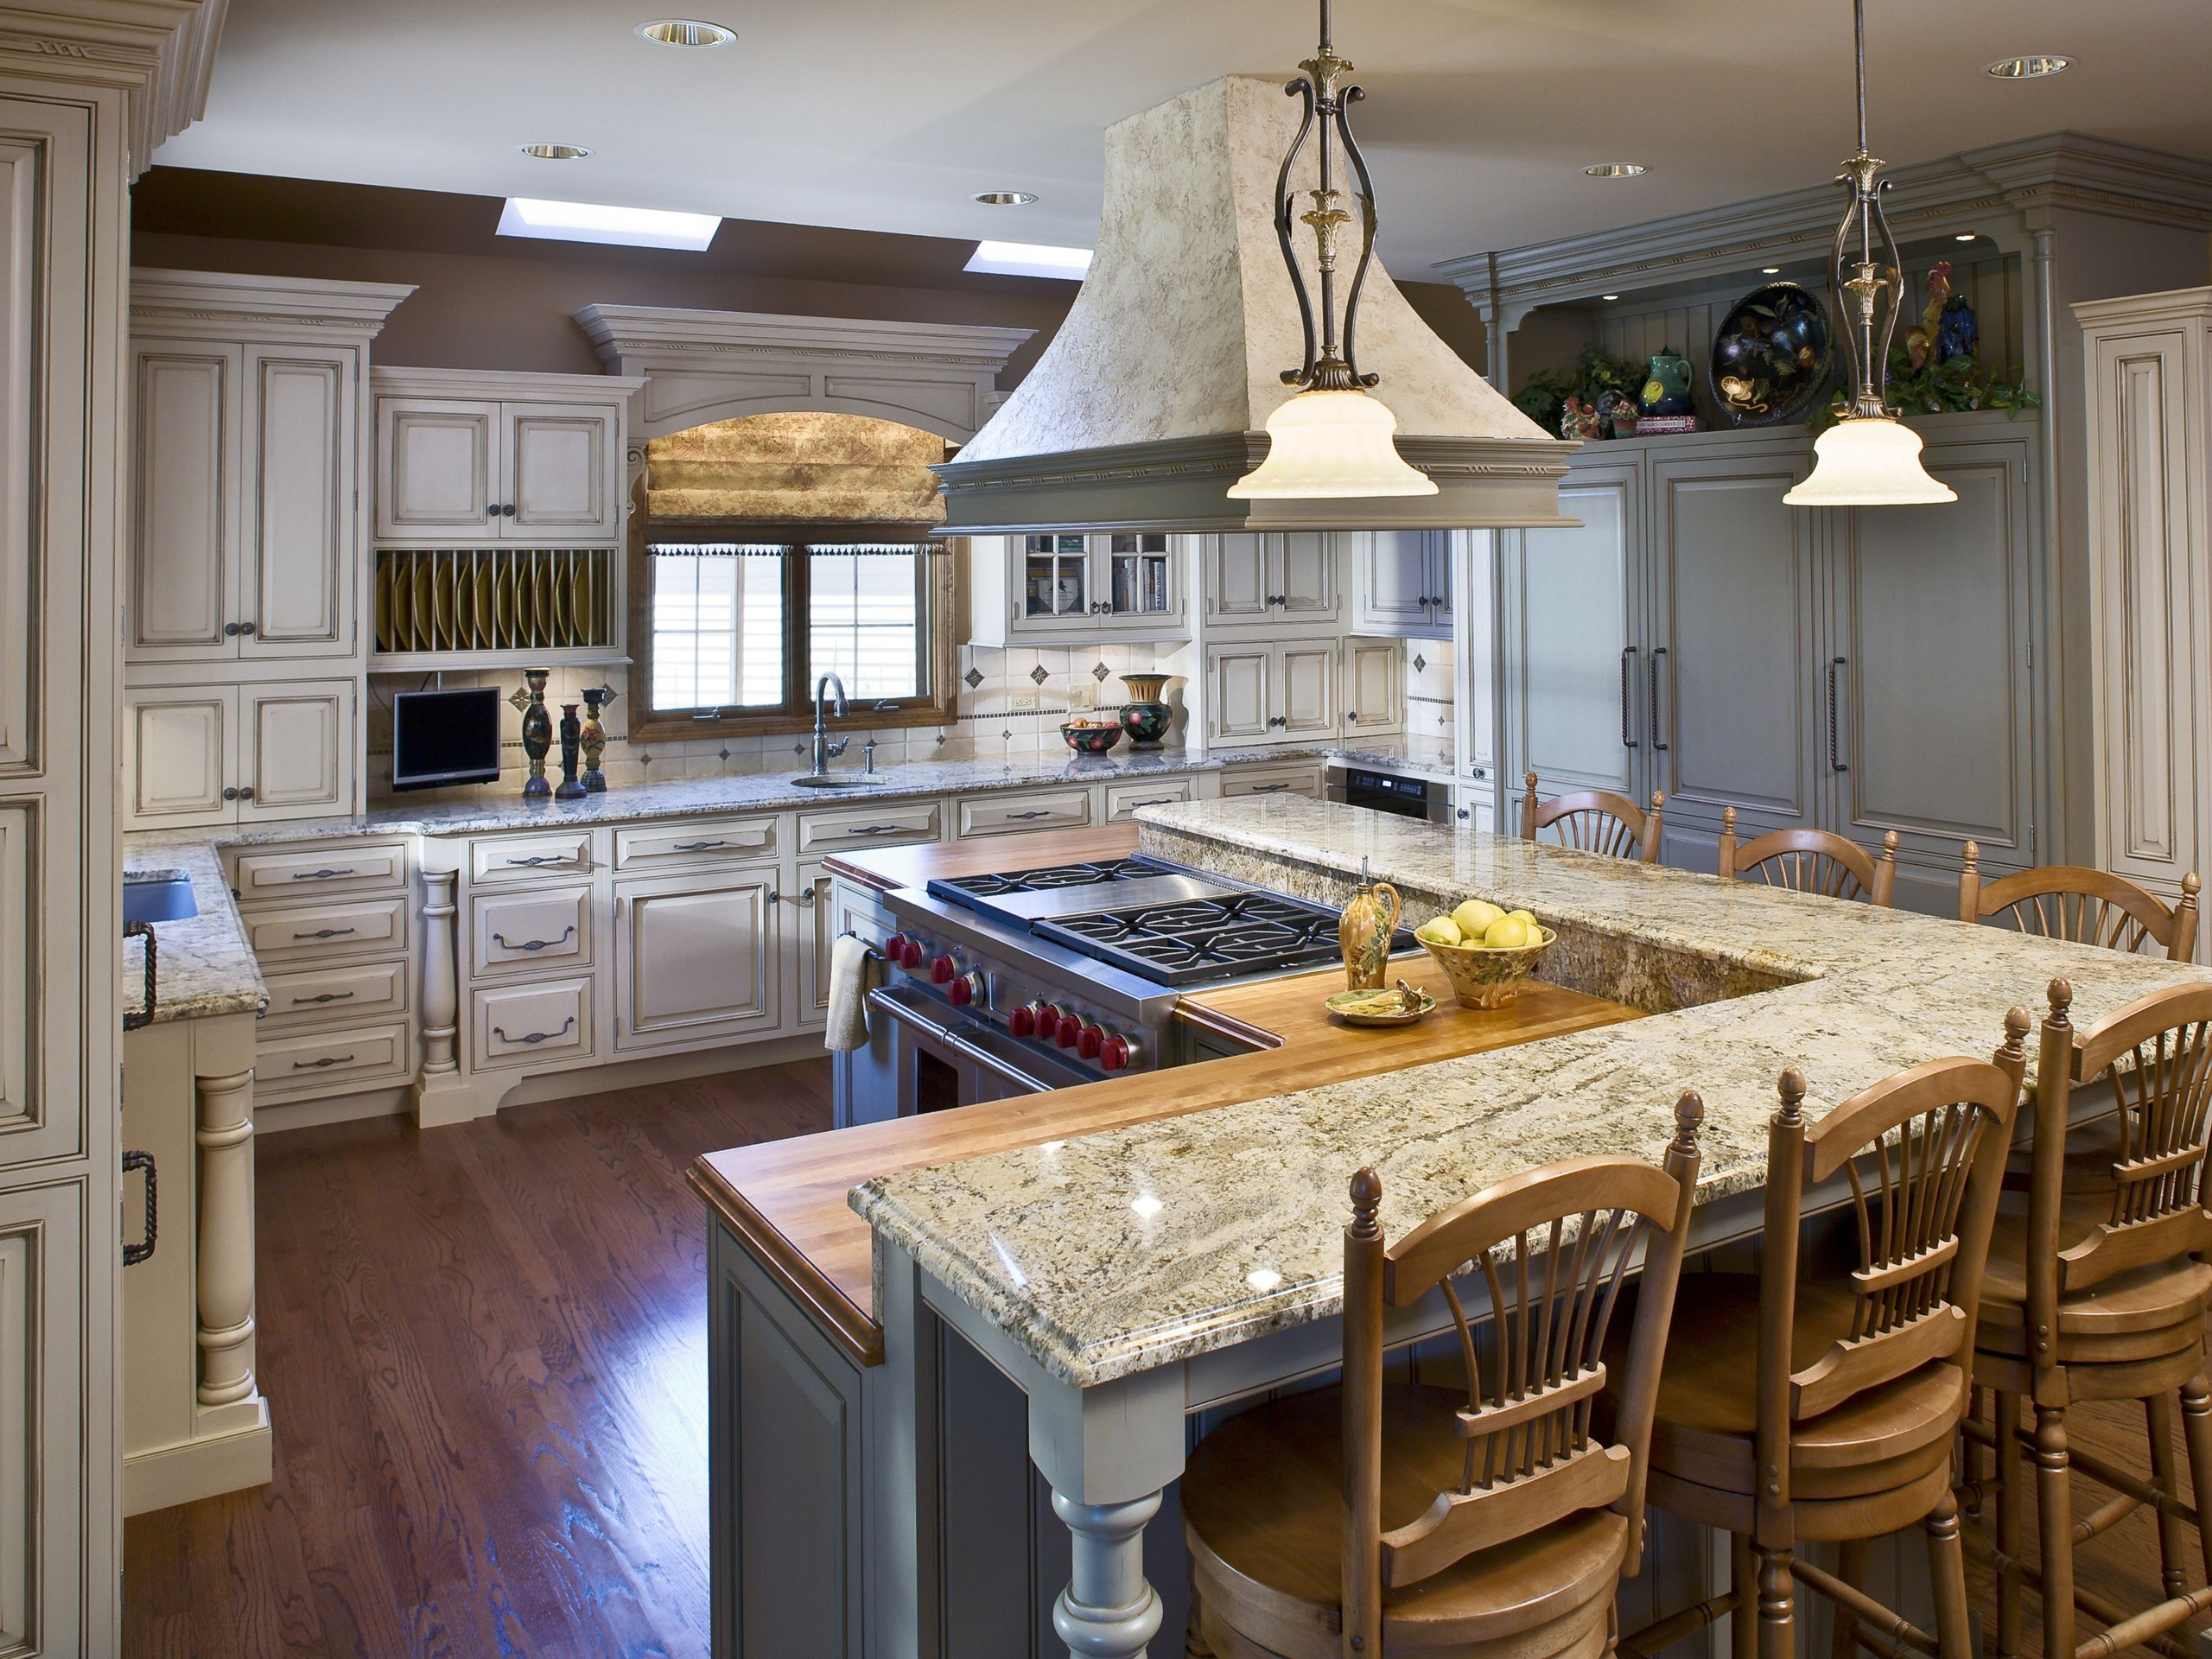 Granite Kitchen Island With Seating